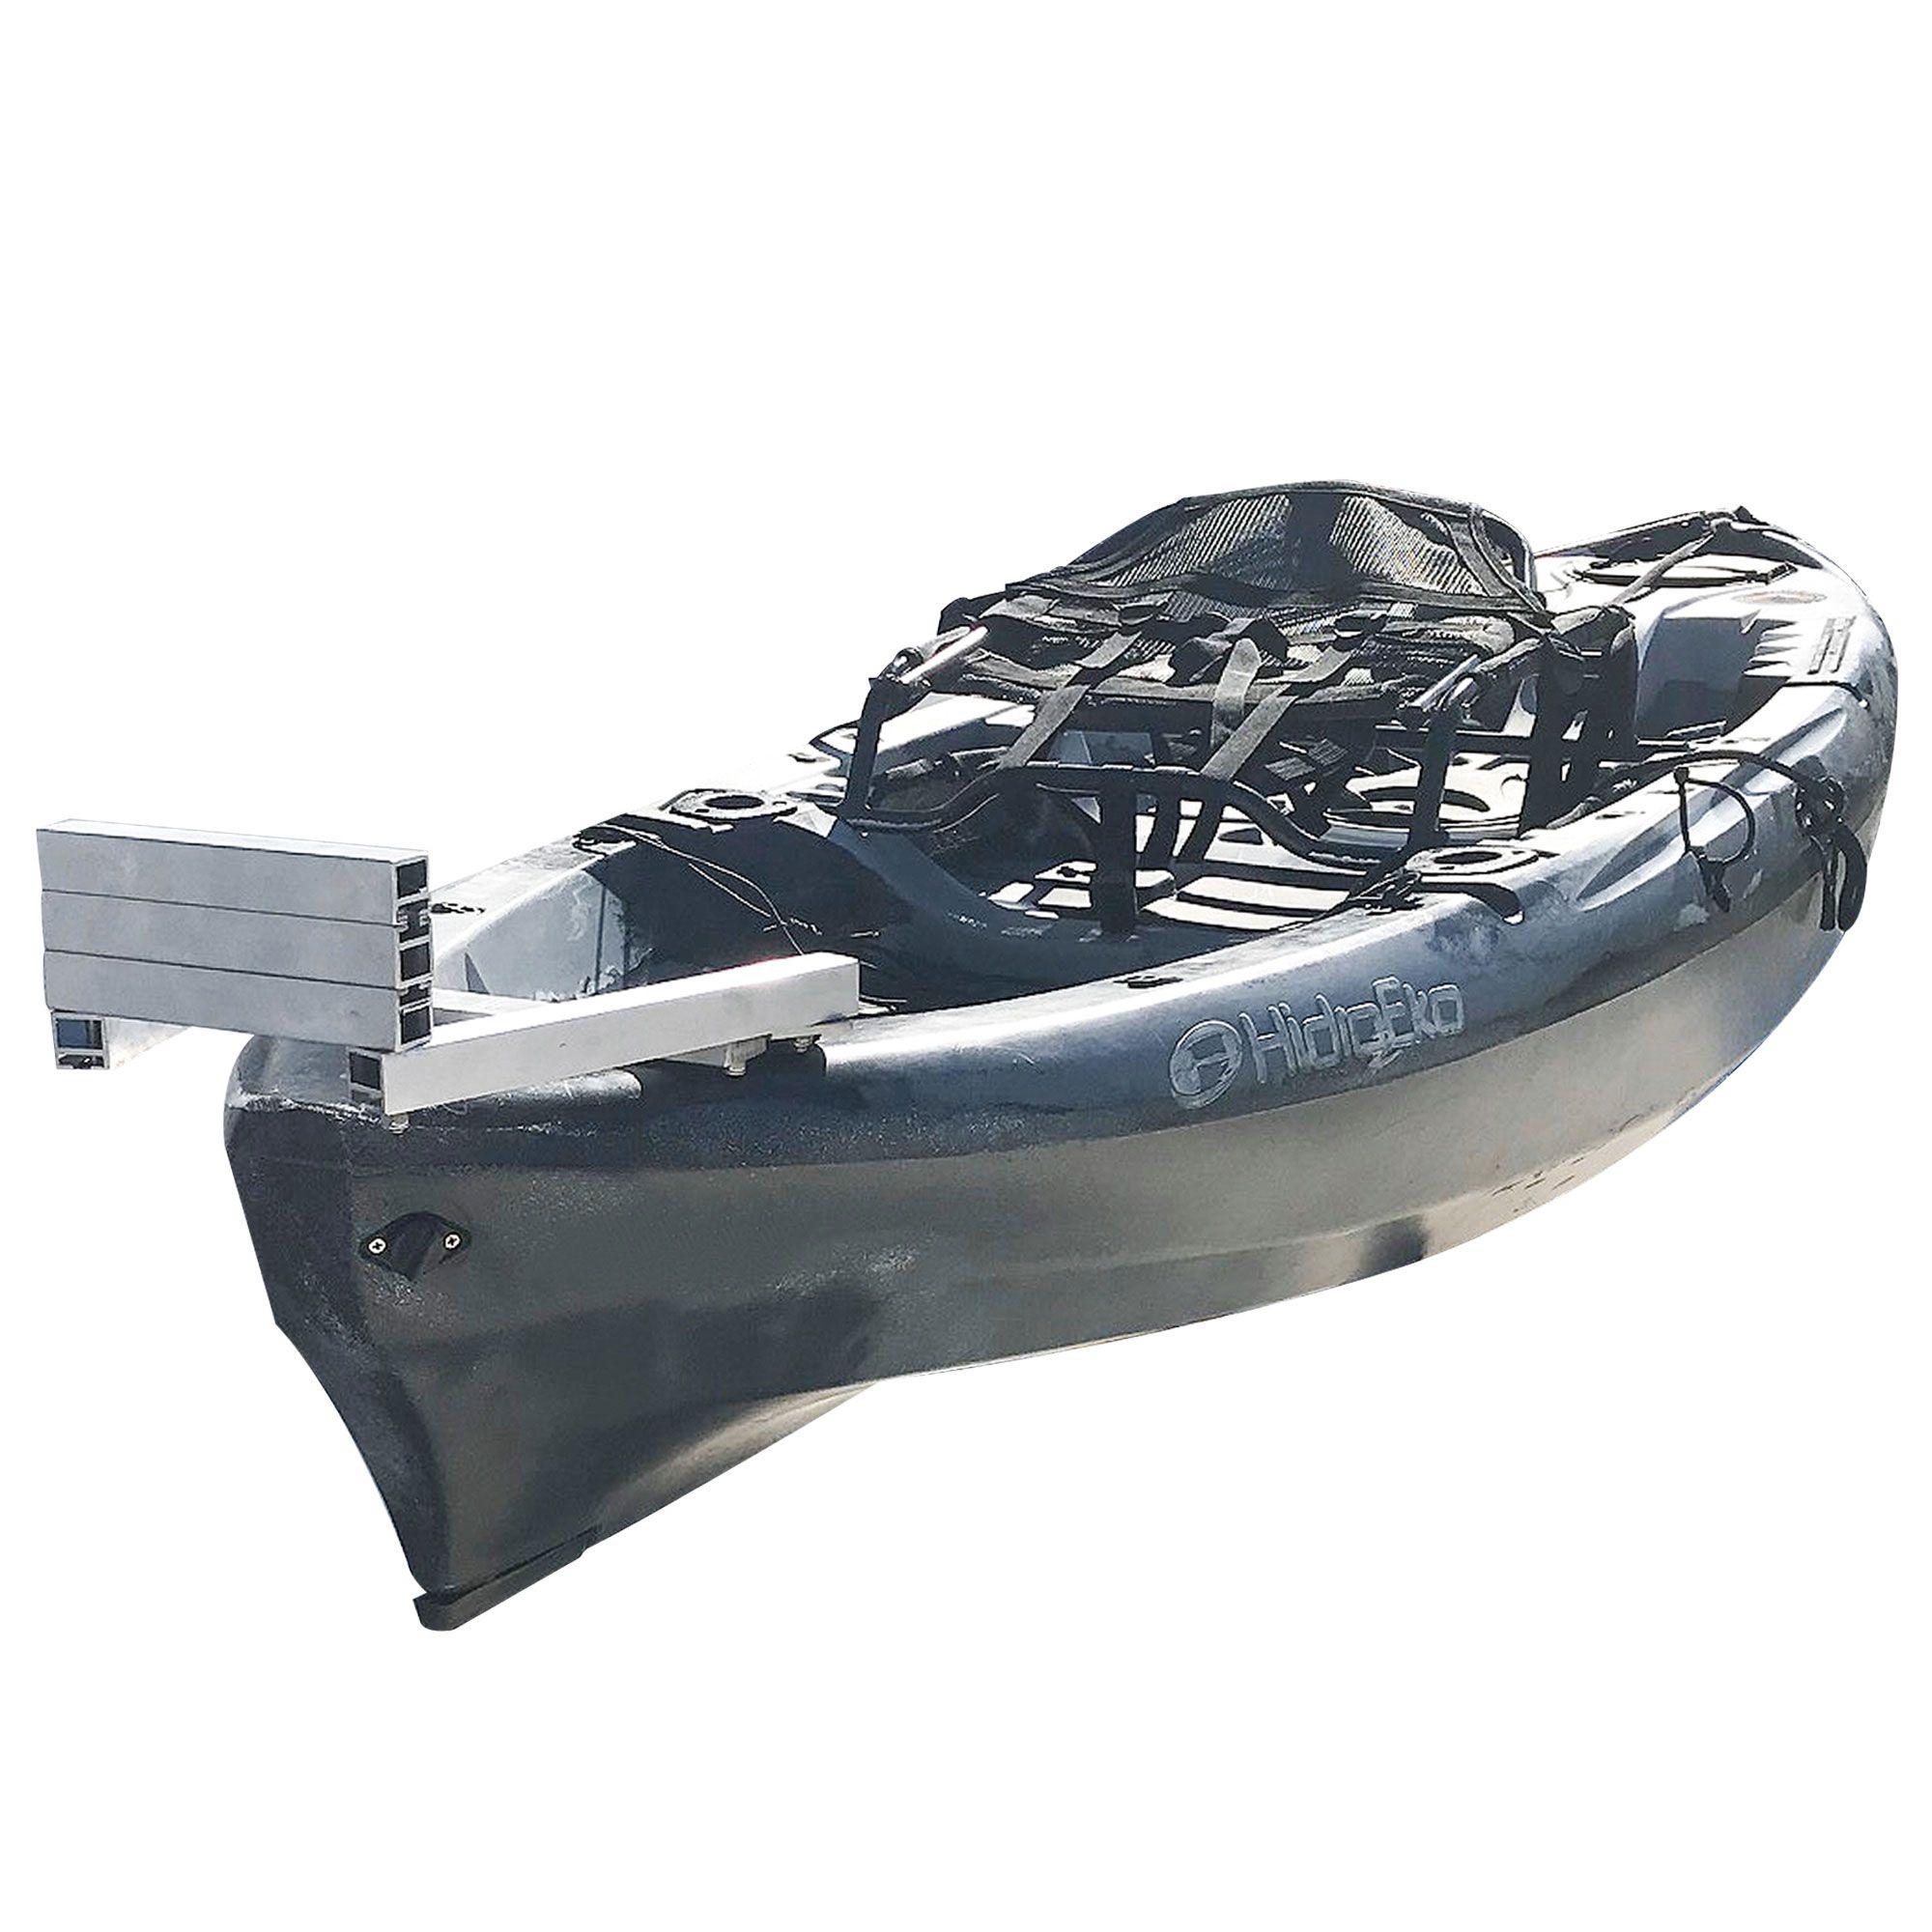 Kit Jet Turbo Cut Pantaneiro + acelerador remoto + Suporte traseiro Caiman 100